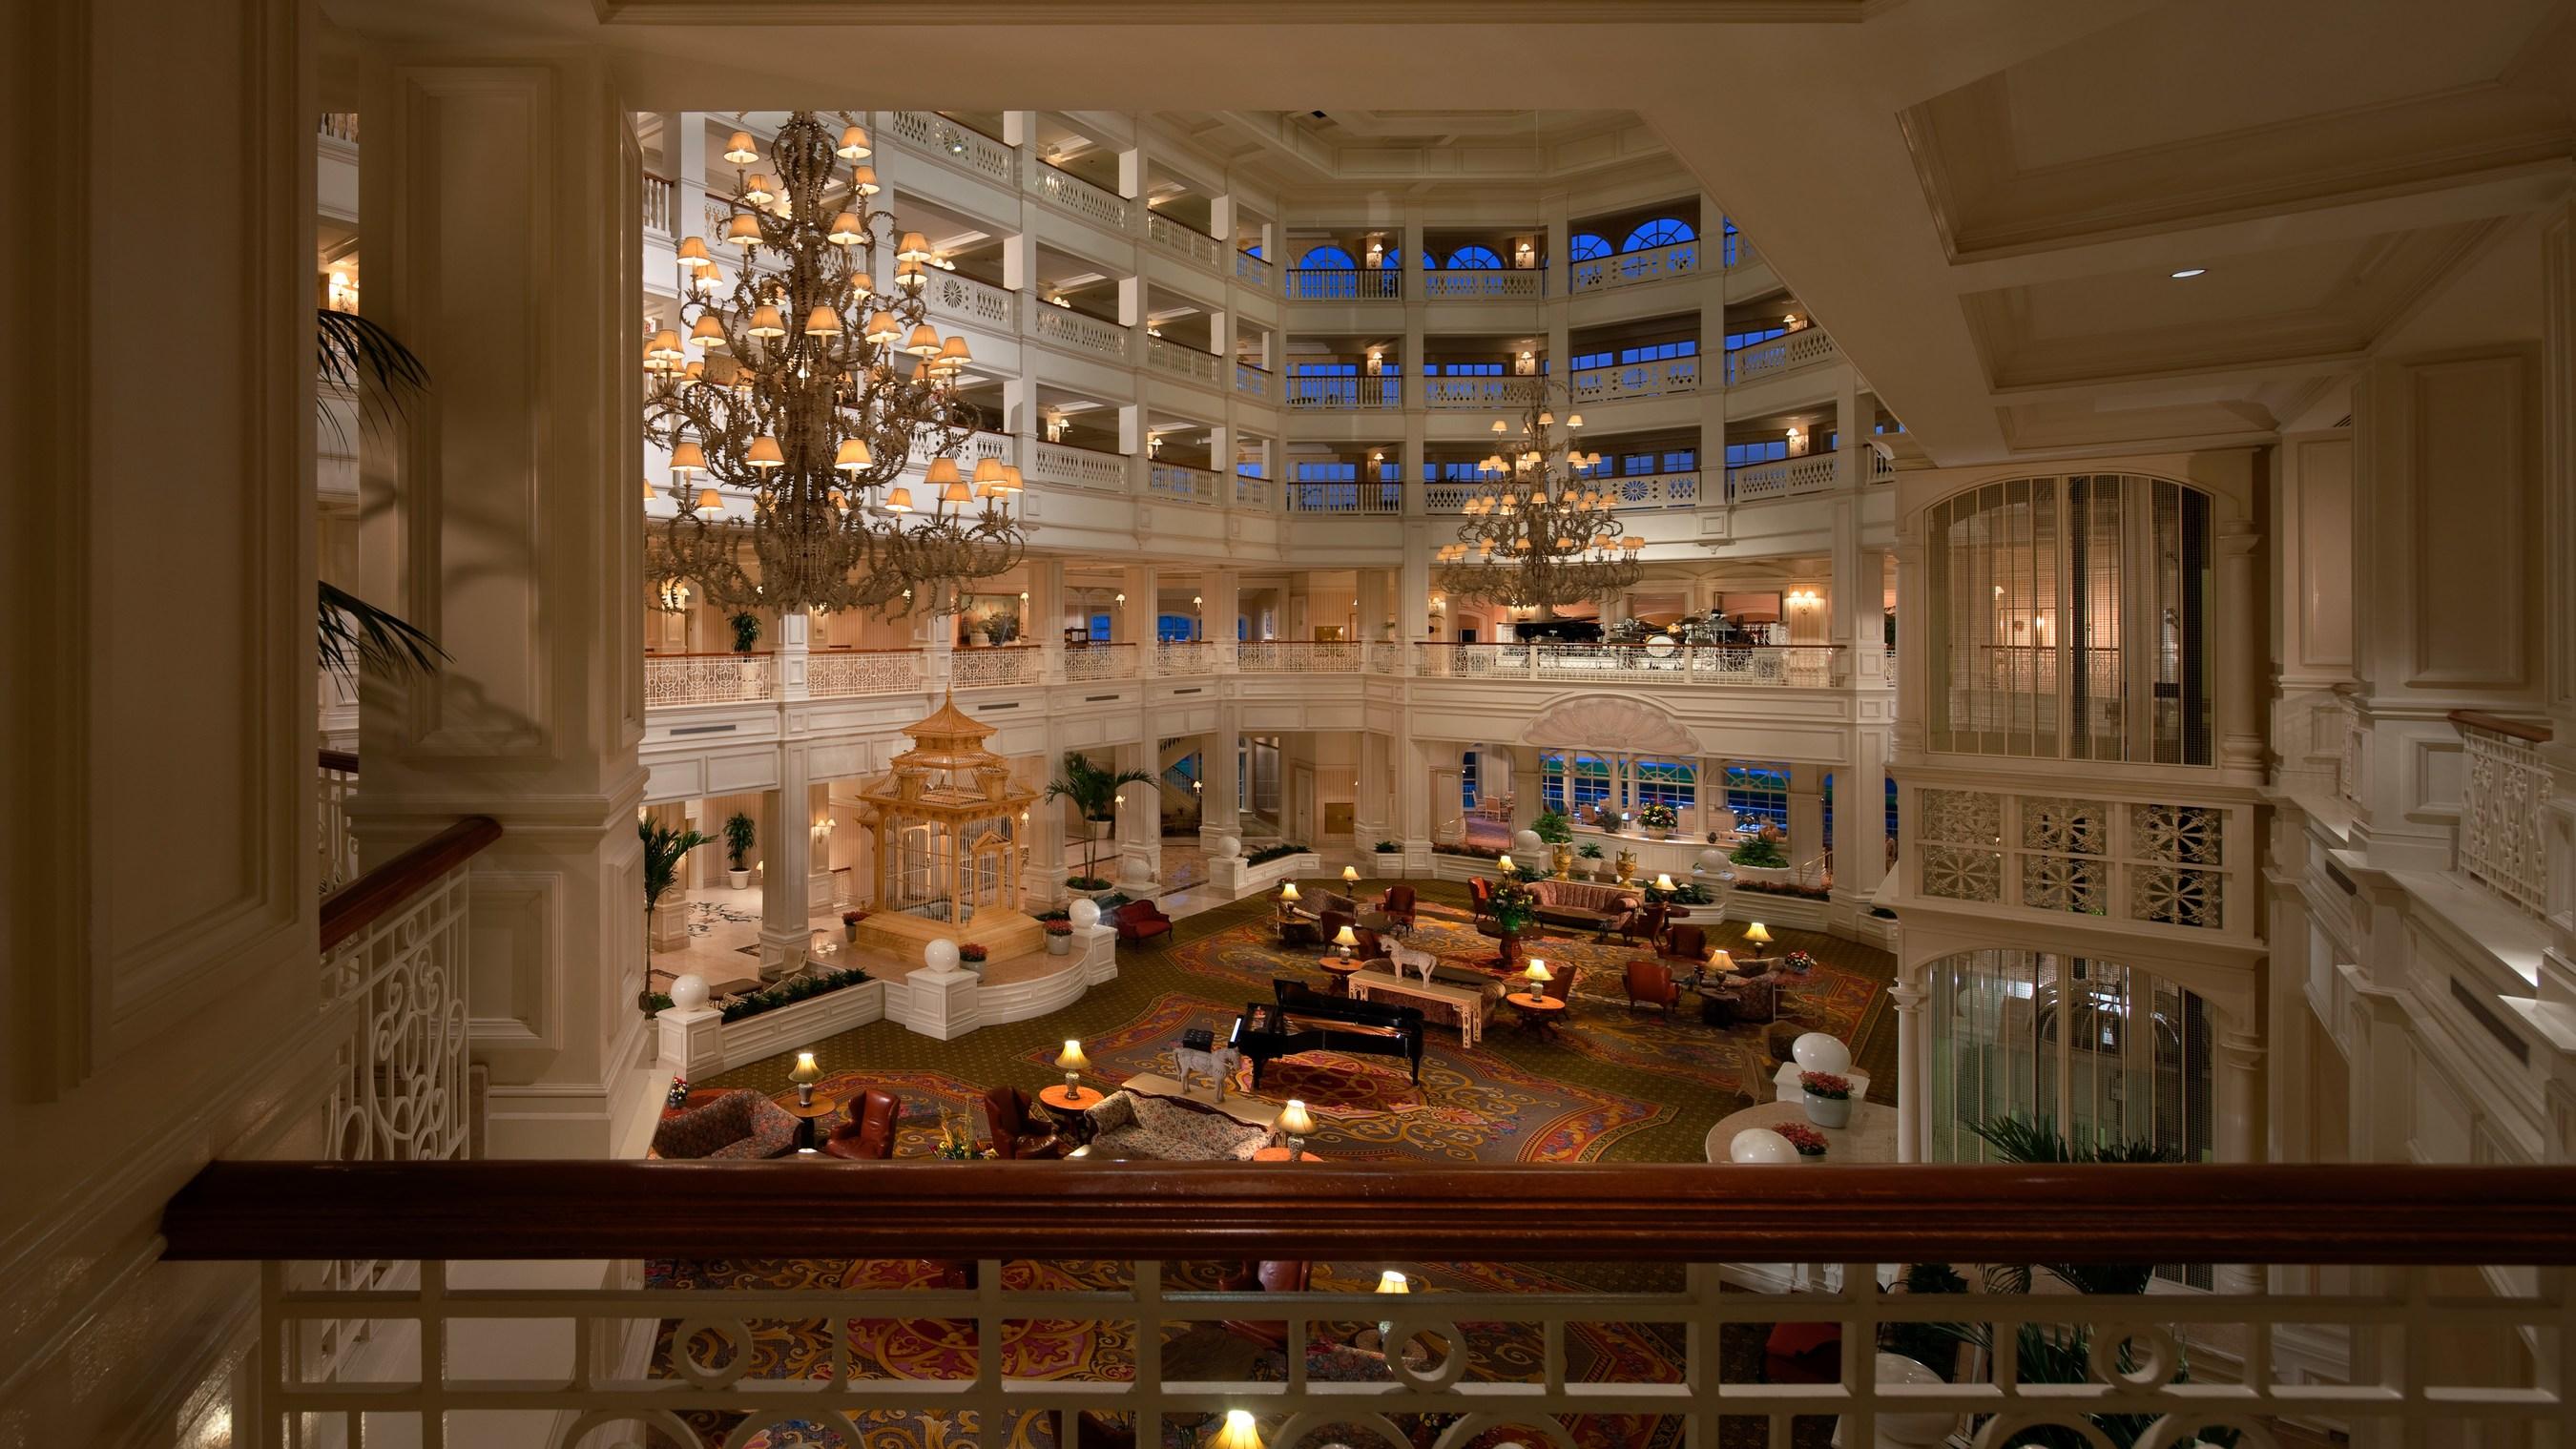 Terrific Disney World Hotels Ranked Which Are The Best Cnn Travel Download Free Architecture Designs Rallybritishbridgeorg